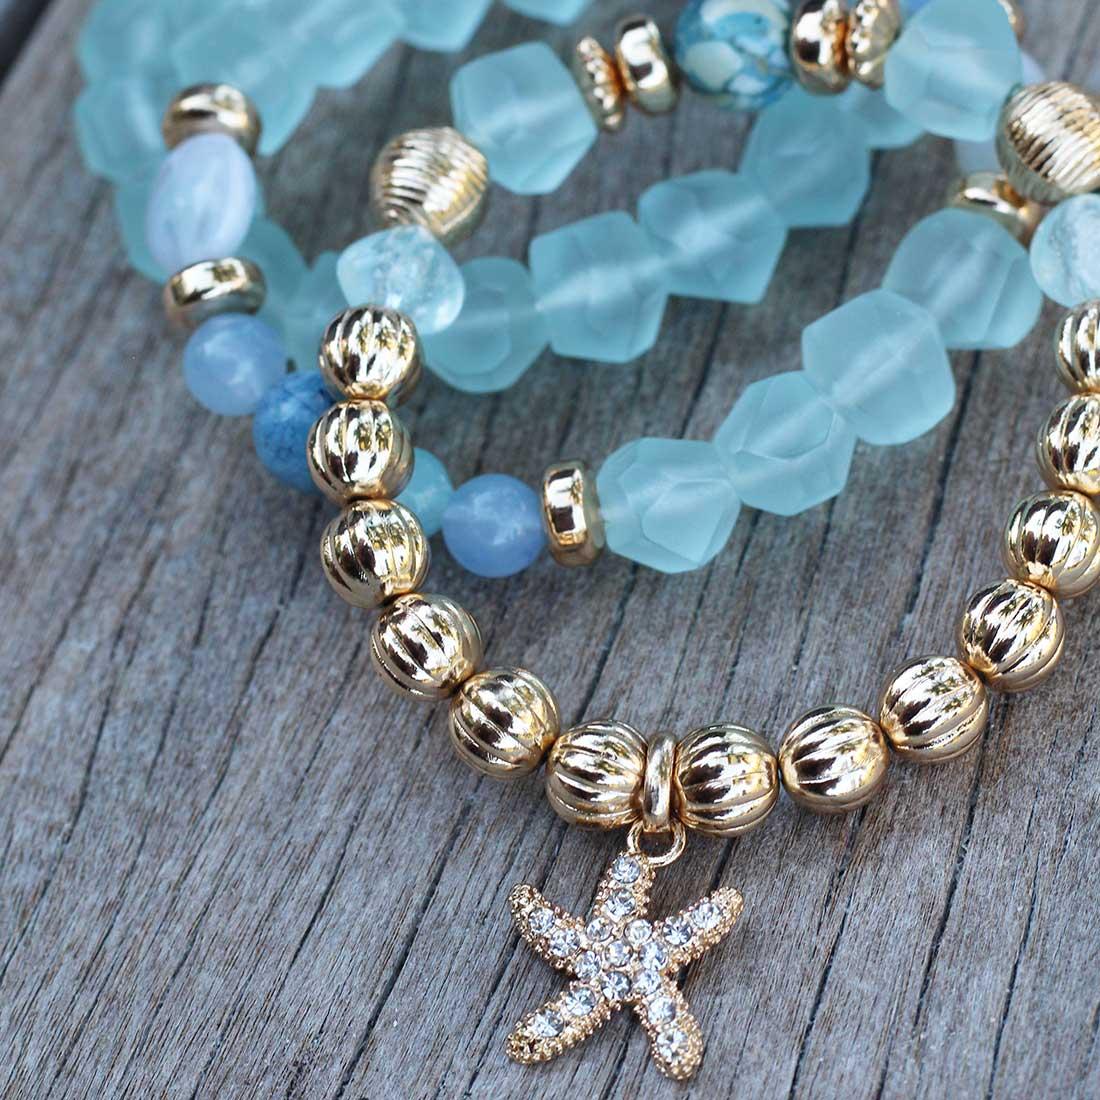 3-Piece Stretch Bracelet Set